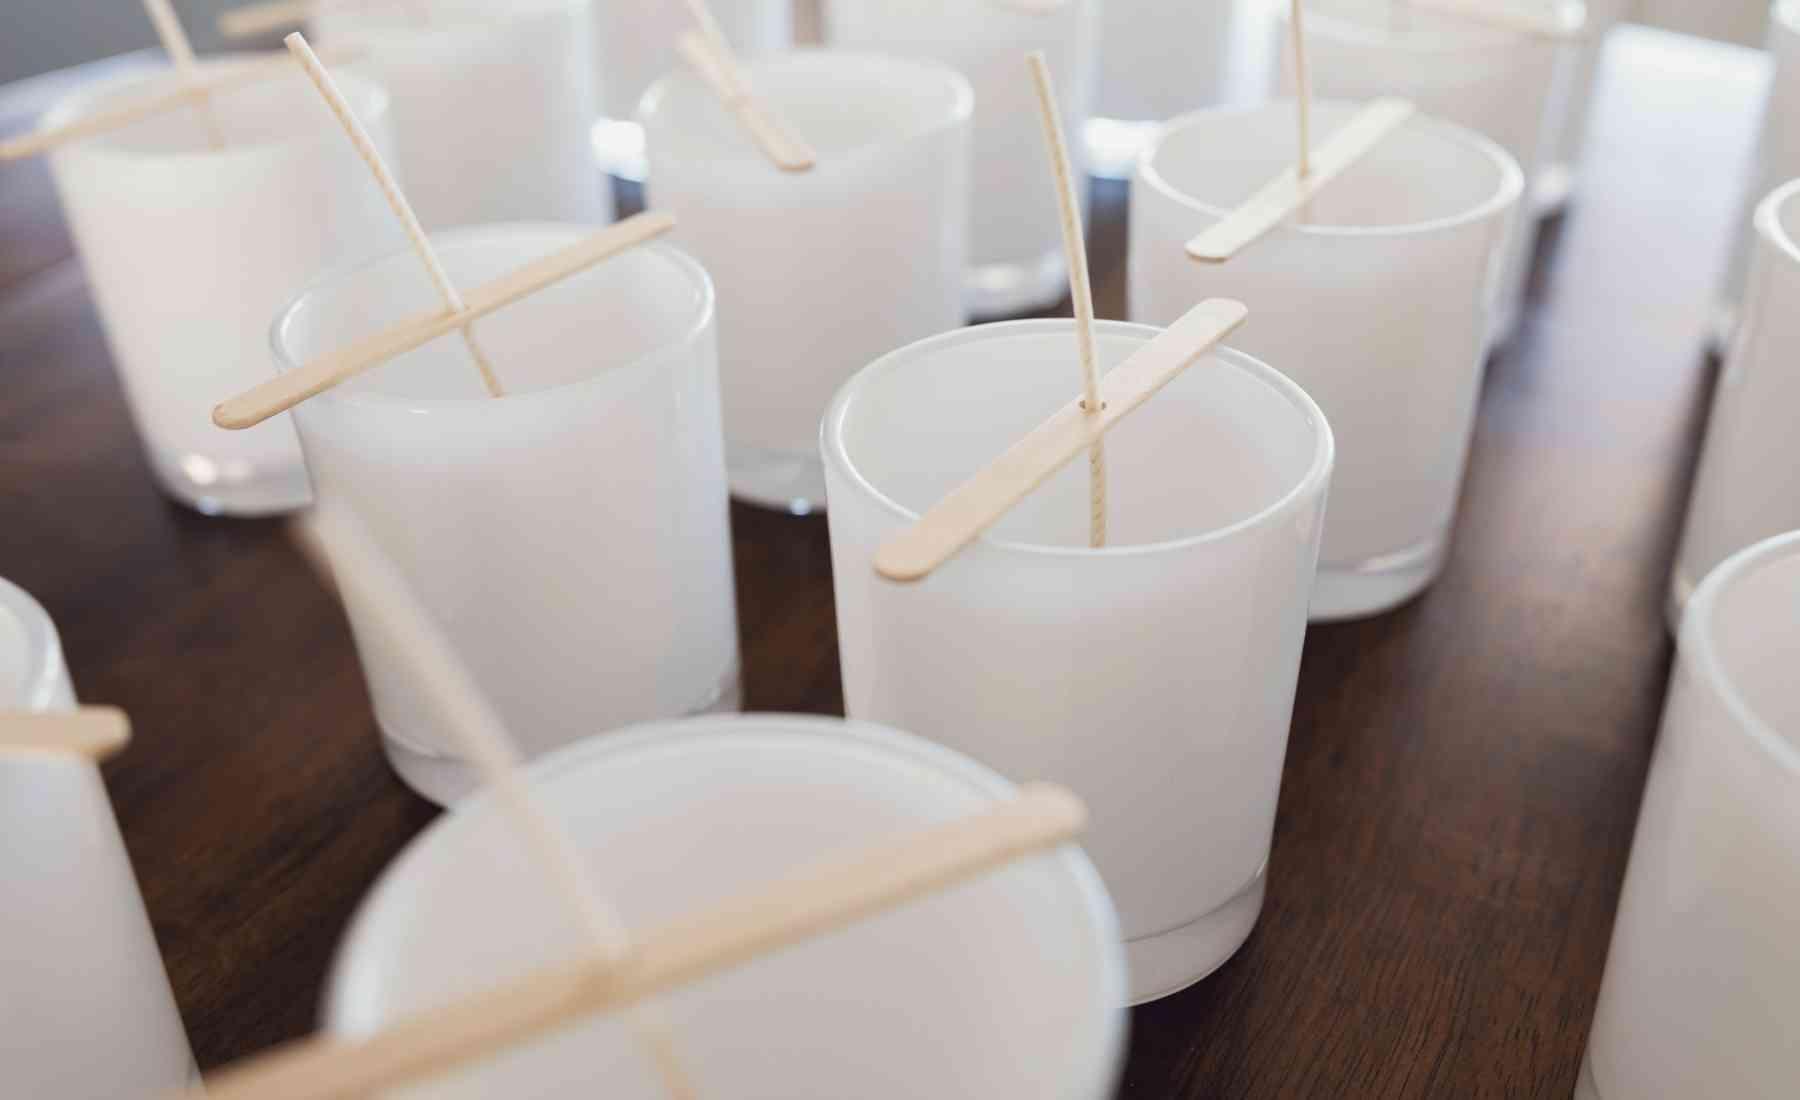 Make $500 a Day - Make Candles